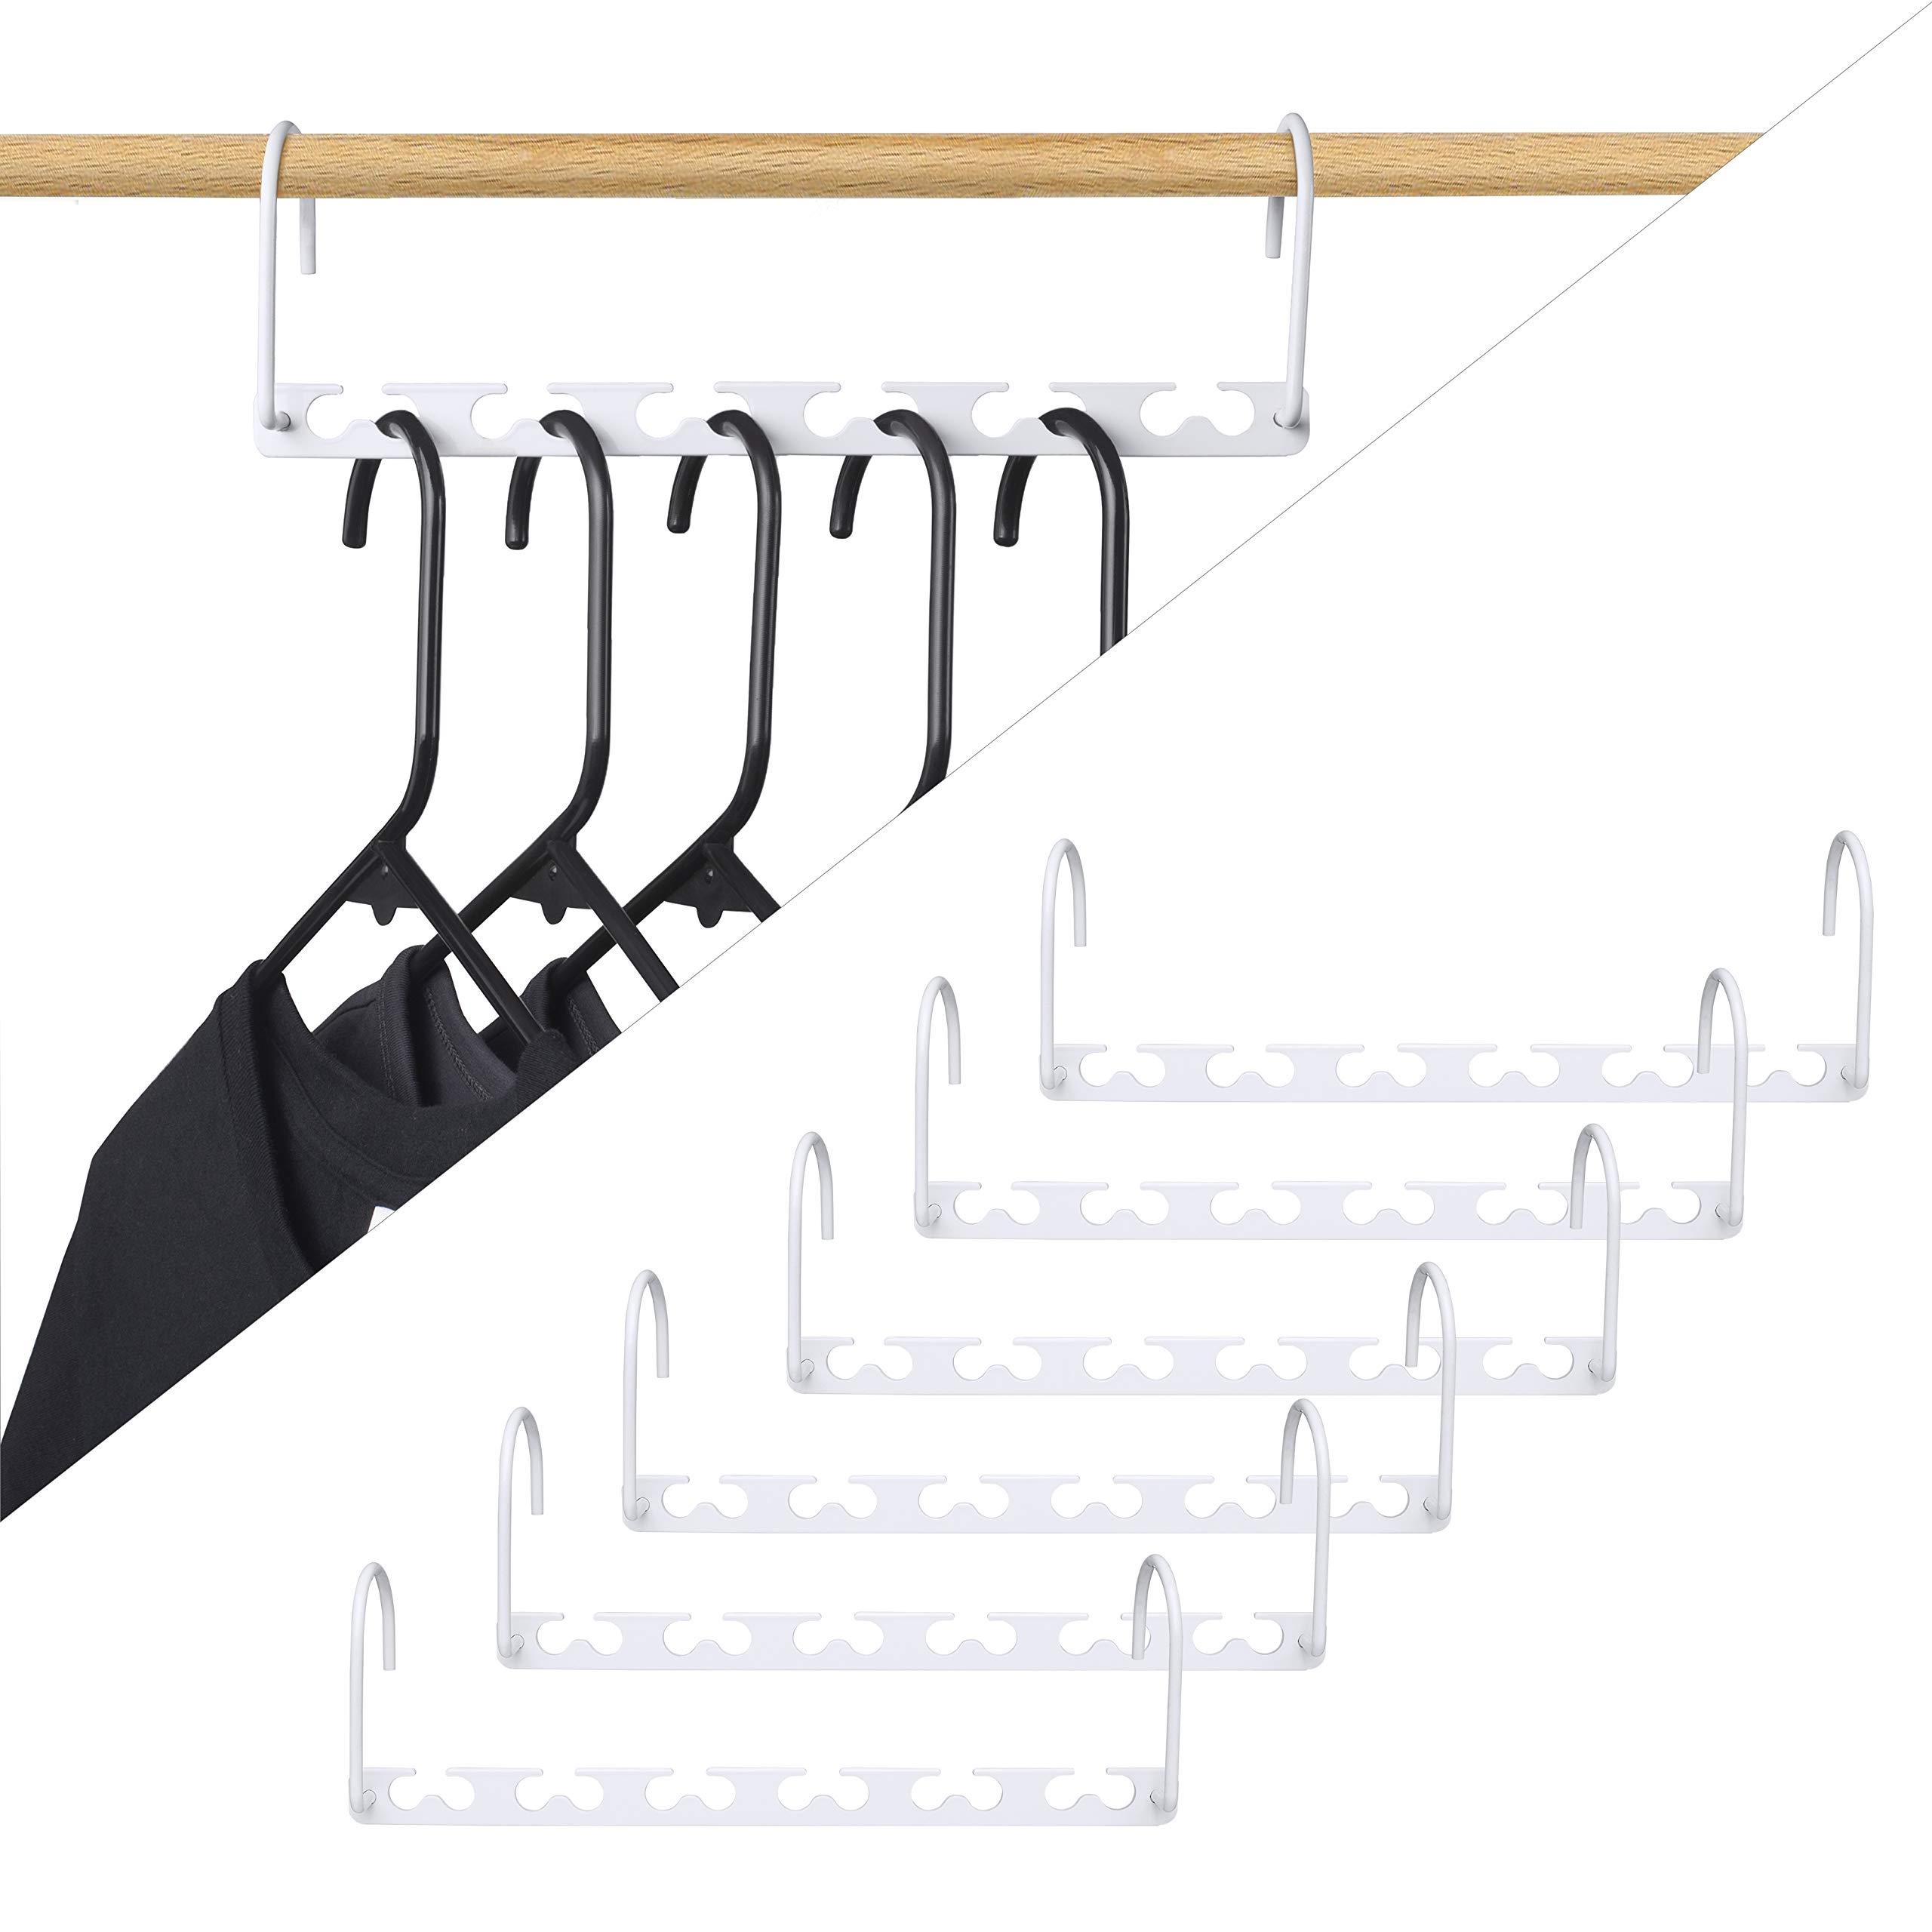 HOUSE DAY 6pcs Magic Hangers Closet Space Saving Wardrobe Clothing Hanger Oragnizer Heavy White Coating Hangers, Updated Hook Design (6)